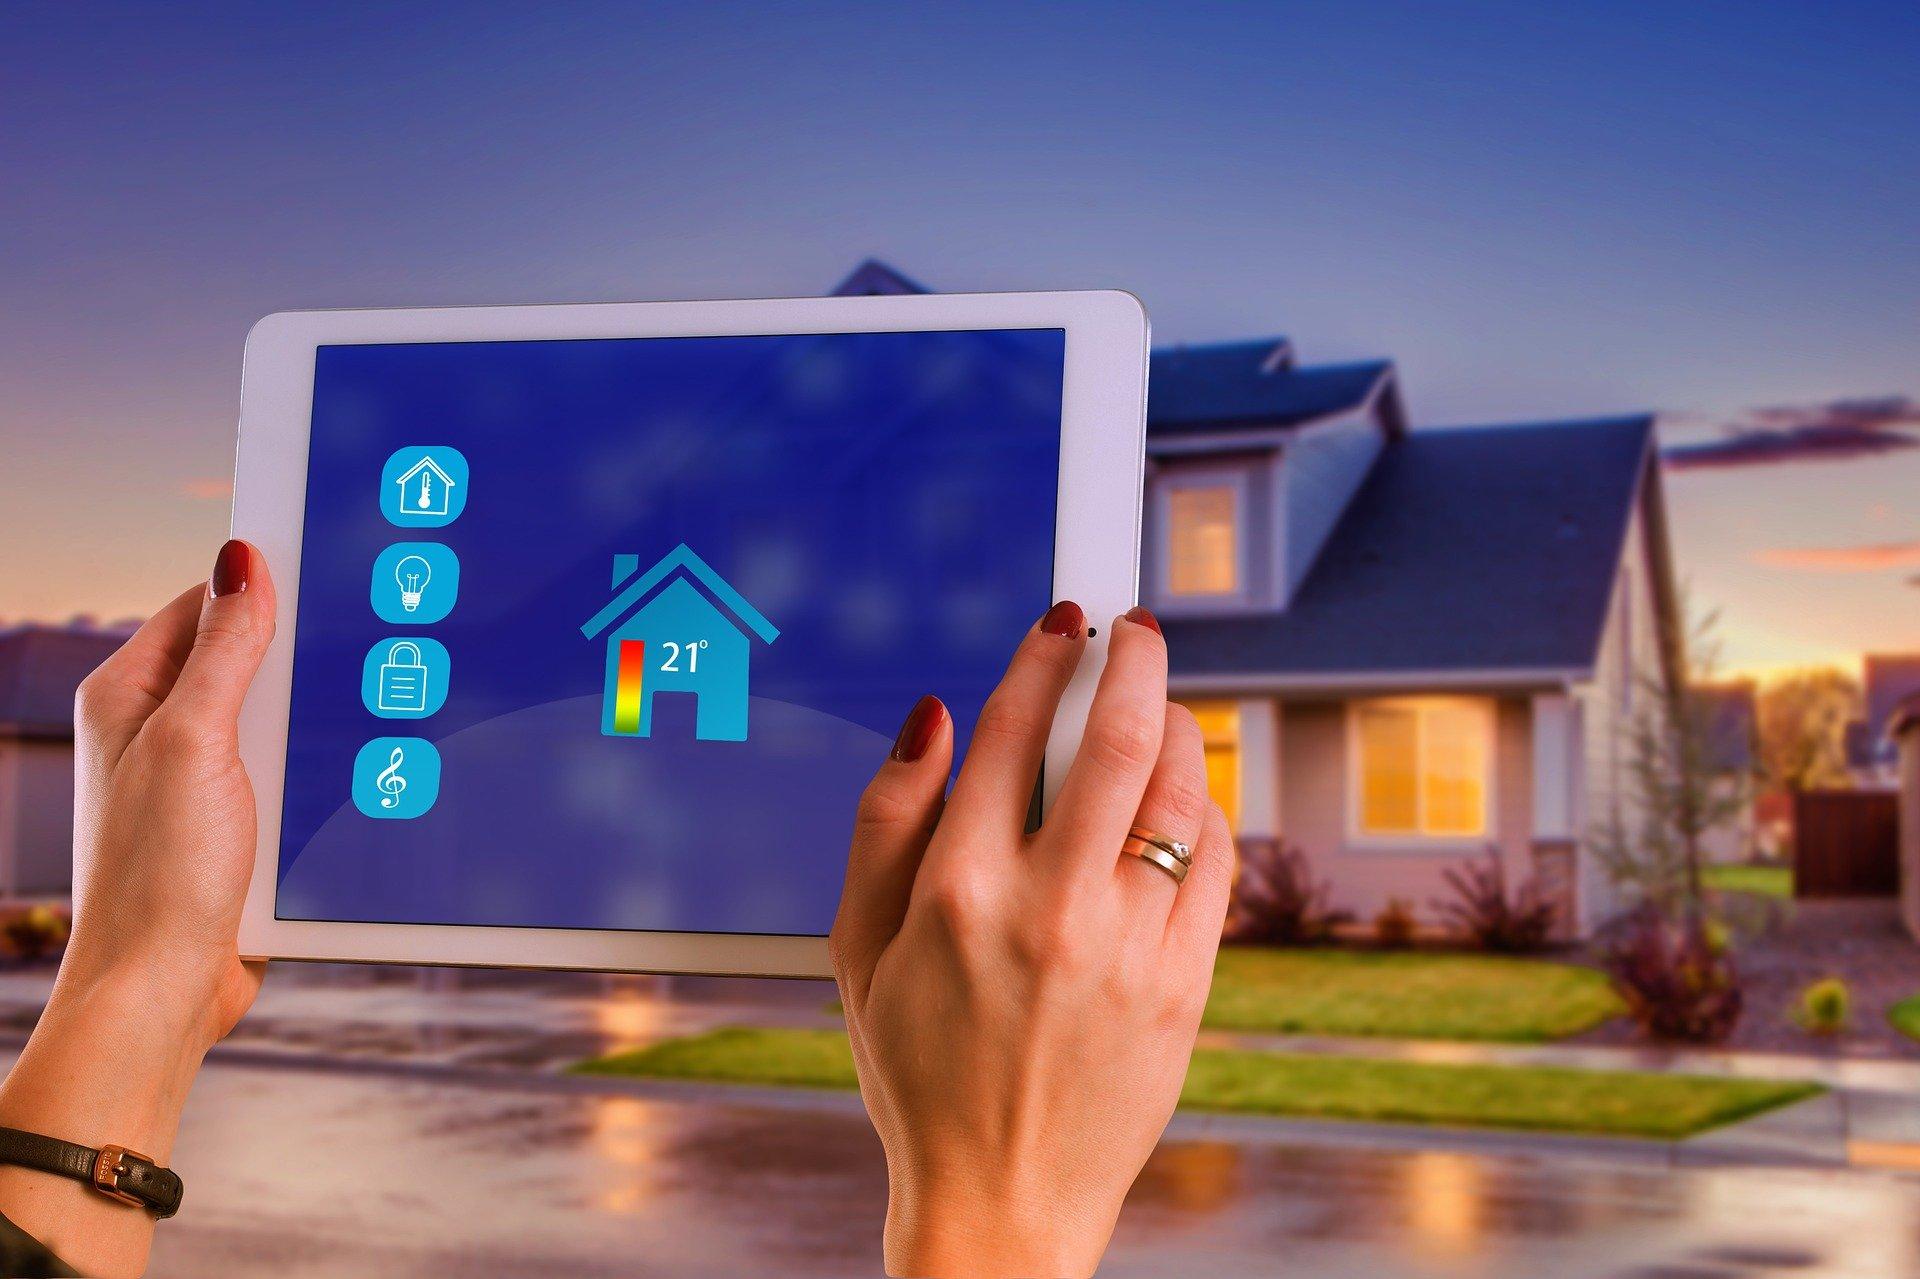 smart-home-knx-smarthome